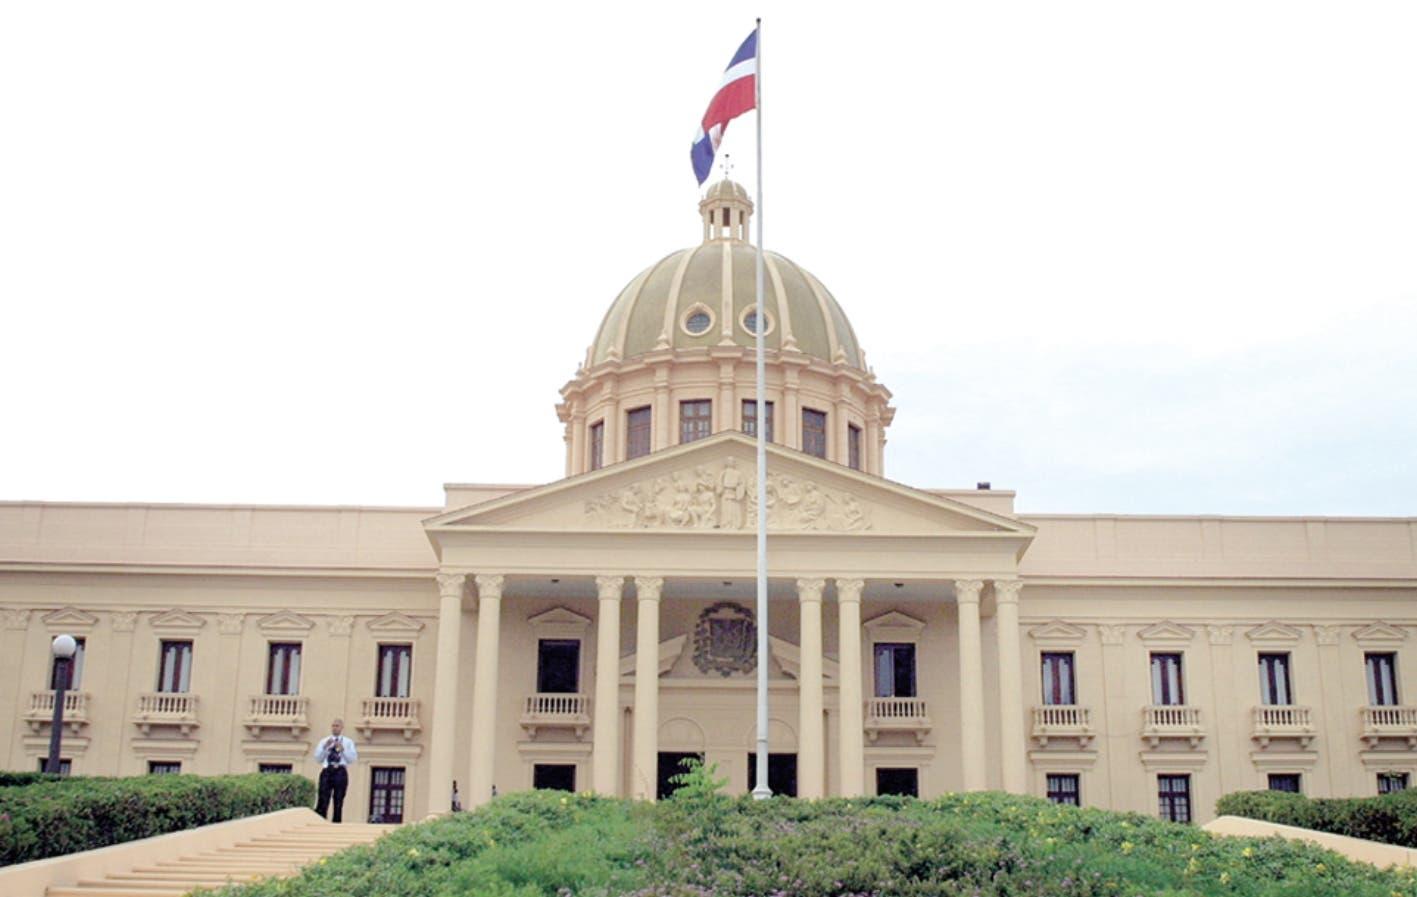 Decreto: Presidente crea comisión liderará estrategia de Marca País para turismo e inversión